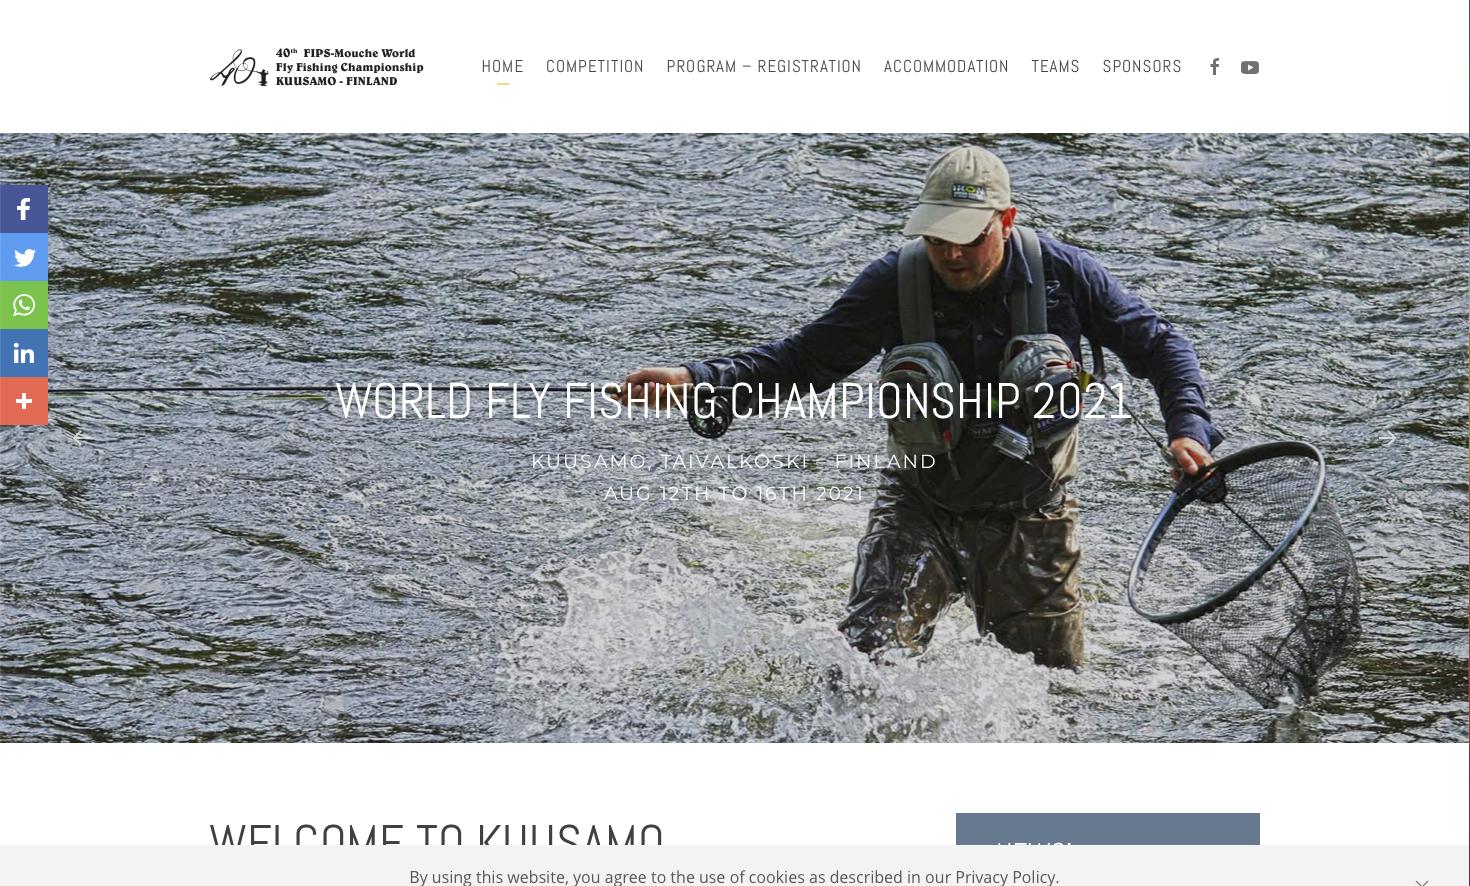 WORLD FLY FISHING CHAMPIONSHIP 2021